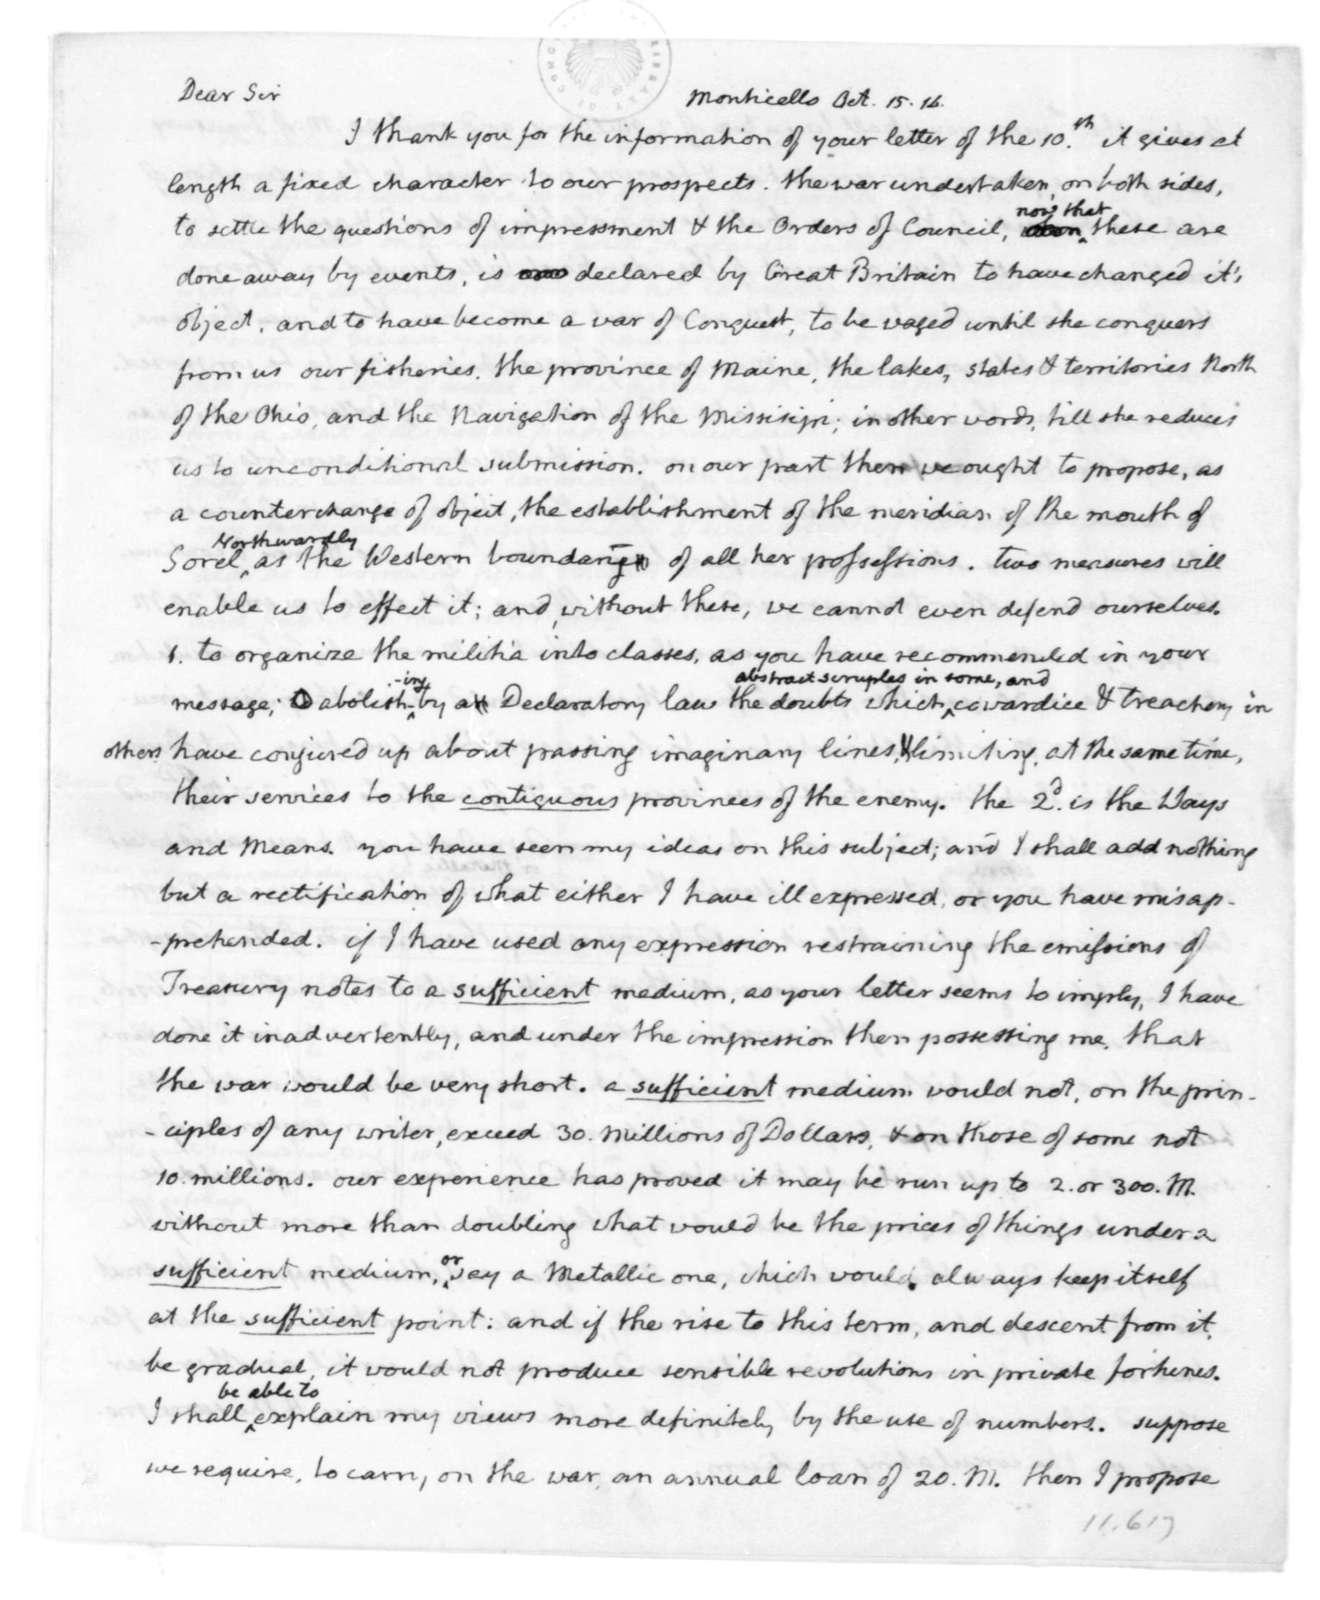 Thomas Jefferson to James Madison, October 15, 1814.